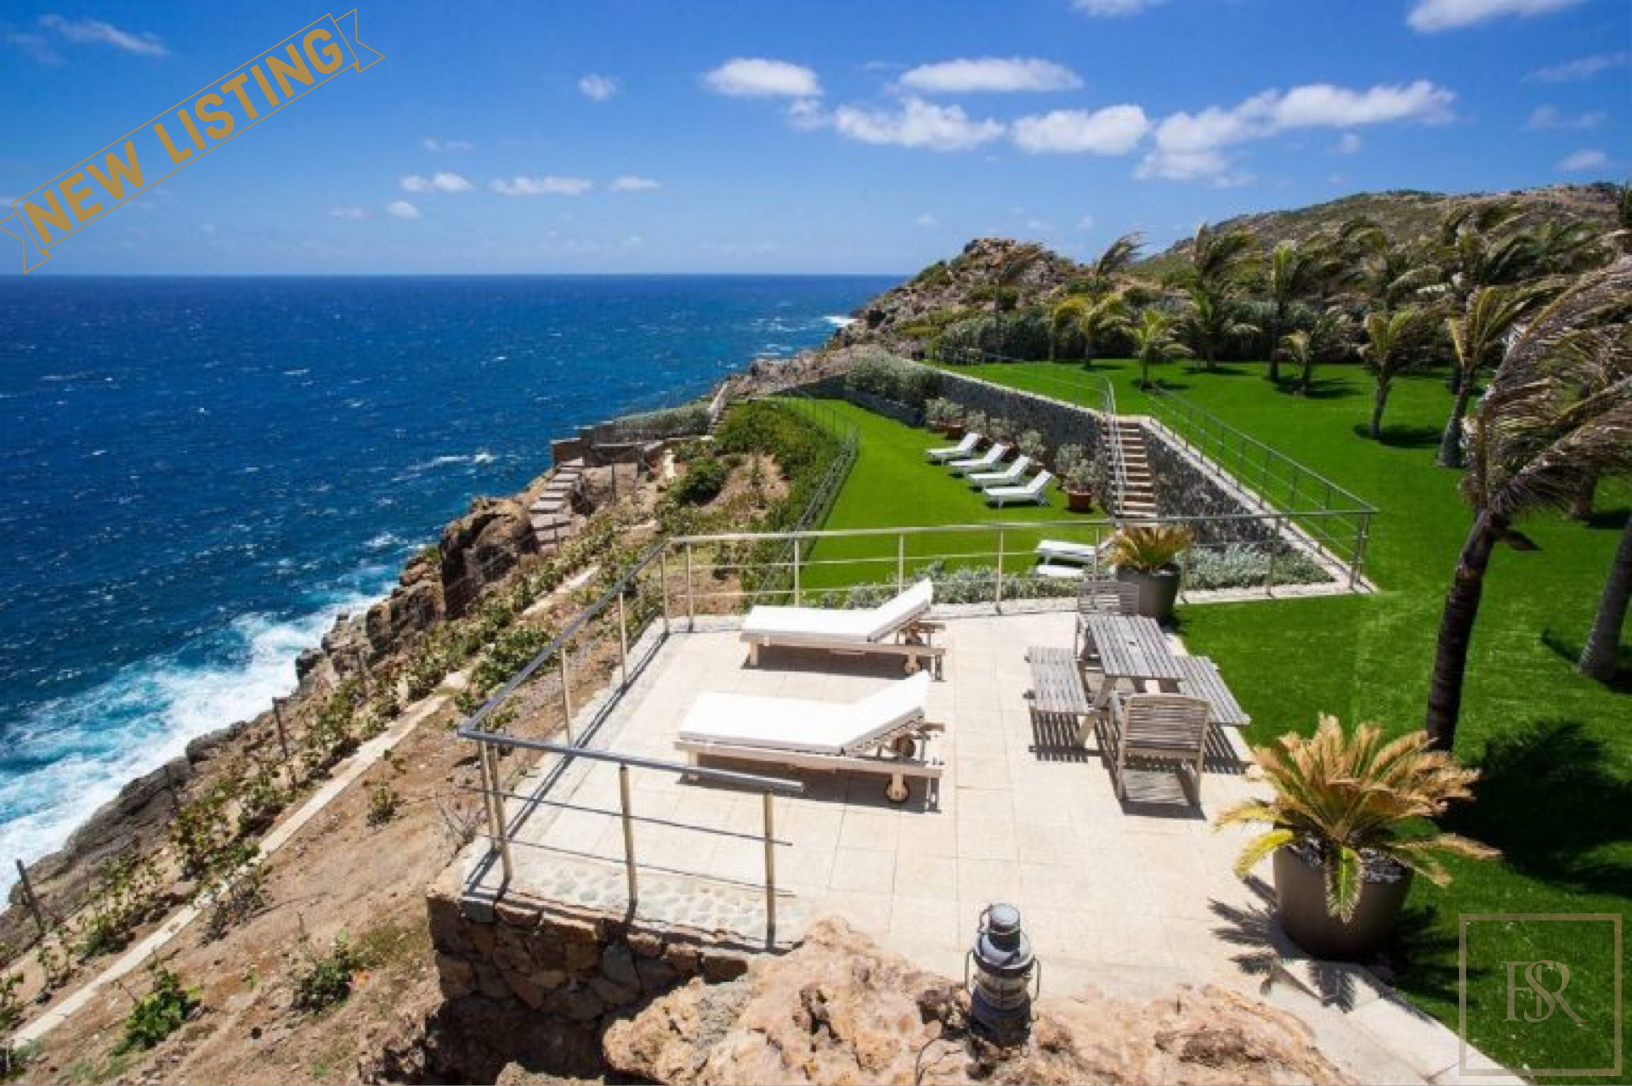 Villa Good News - Levant, St Barth / St Barts for sale For Super Rich